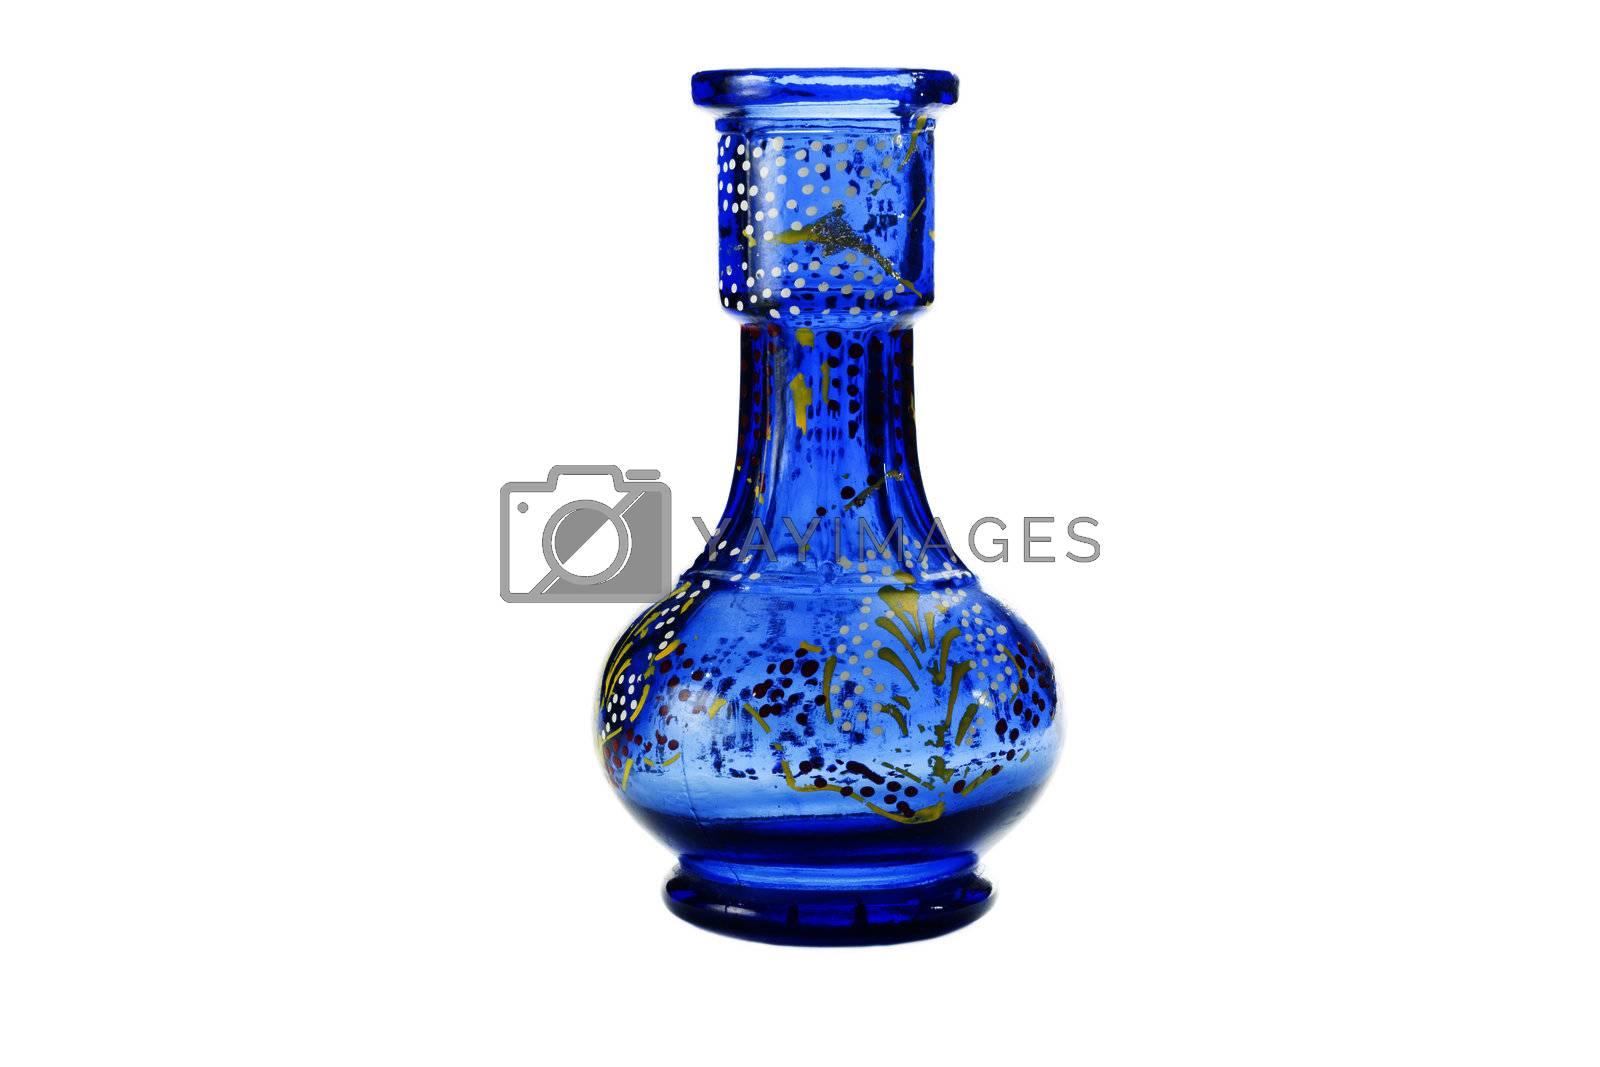 Isolated blue flower vase on a white background